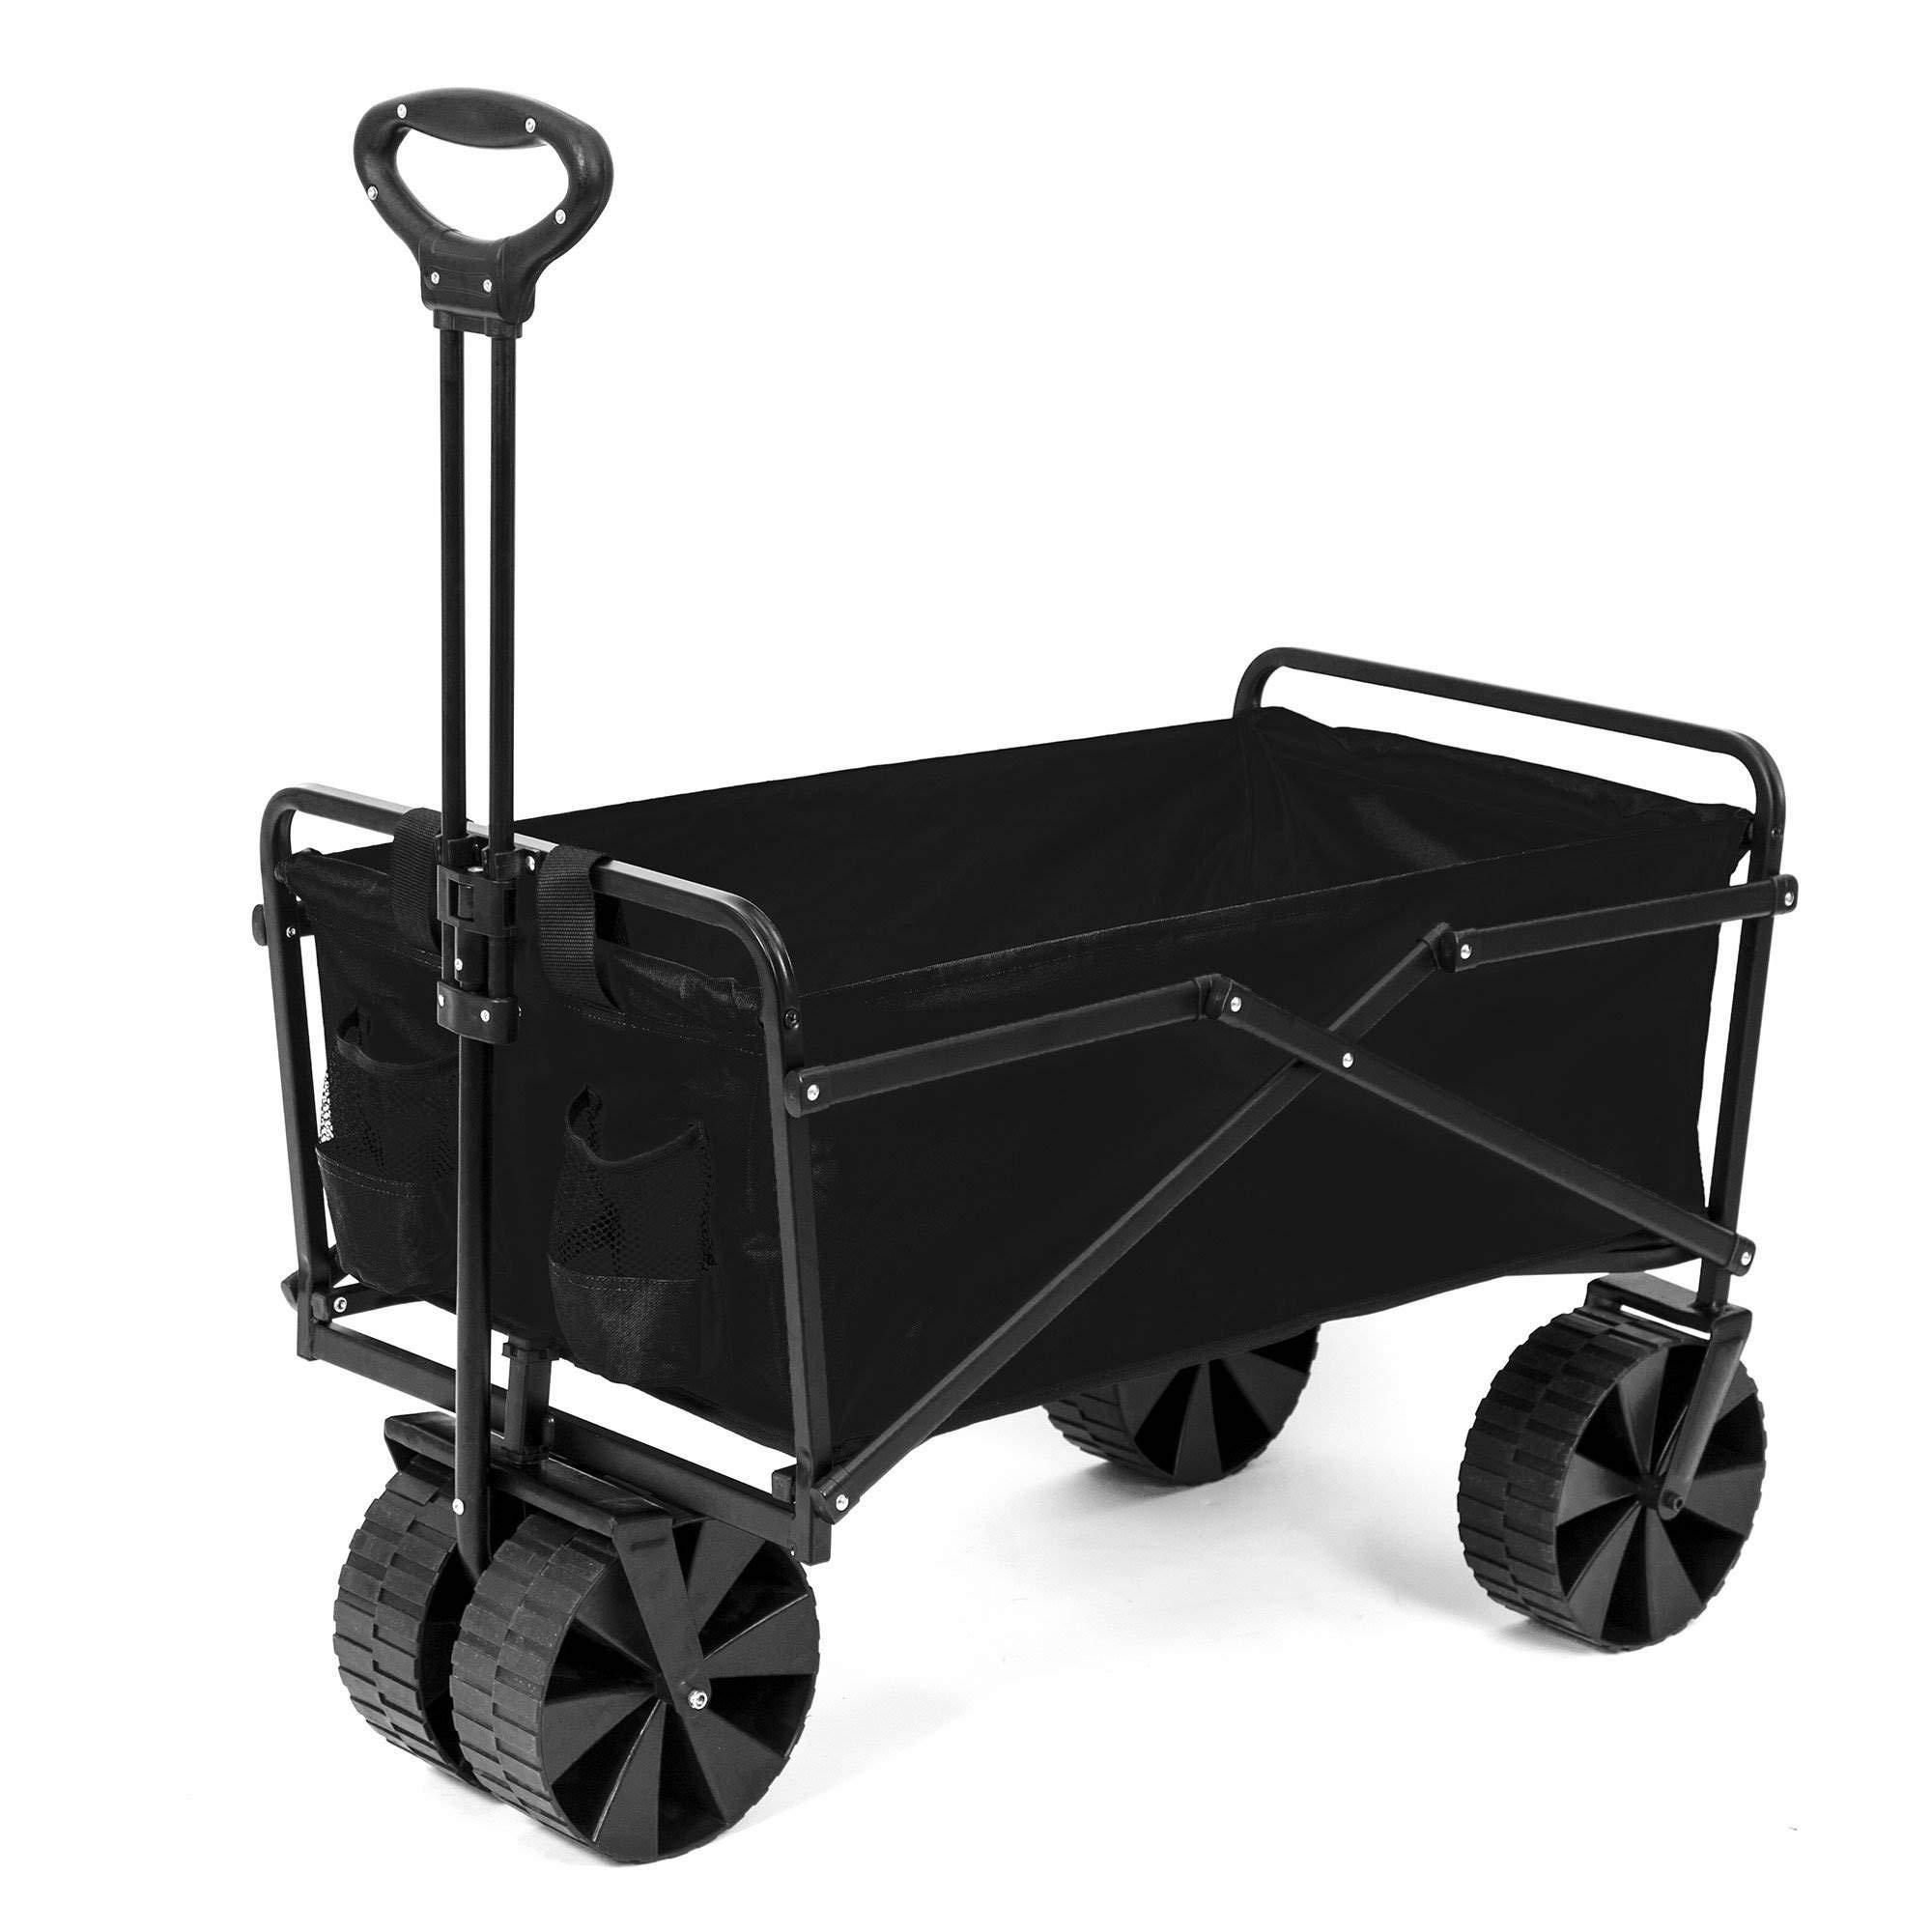 Seina Steel Frame Folding Utility Beach Wagon Outdoor Cart, Black (Open Box) by SEINA